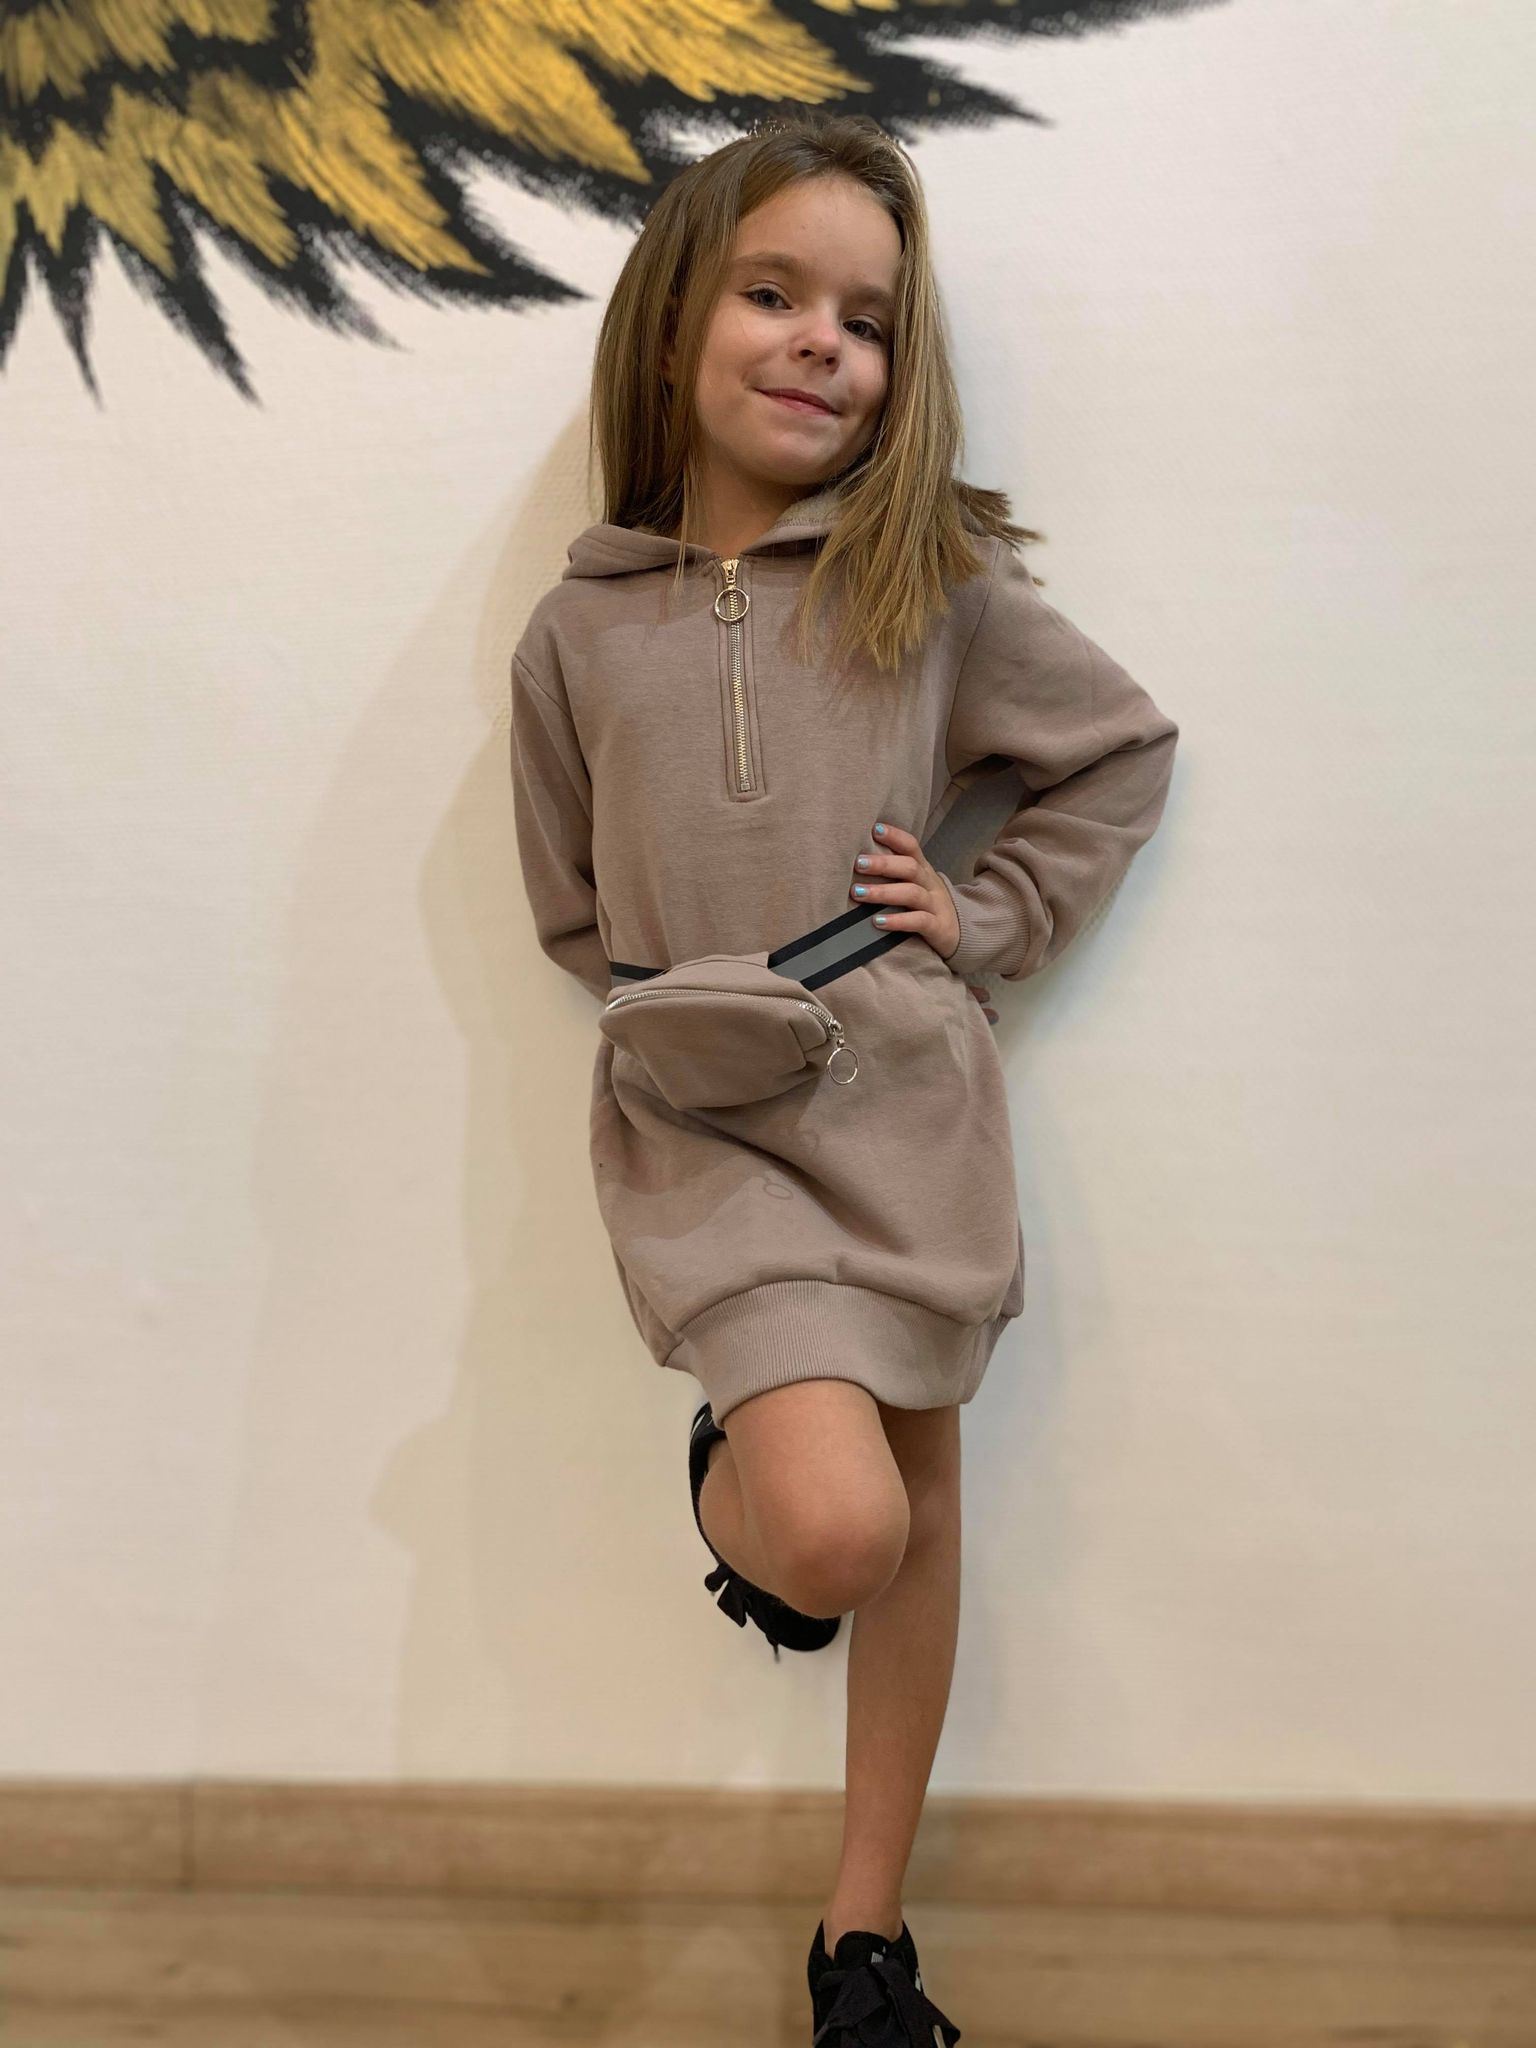 robe sacoche enfant - rob-sac-enf